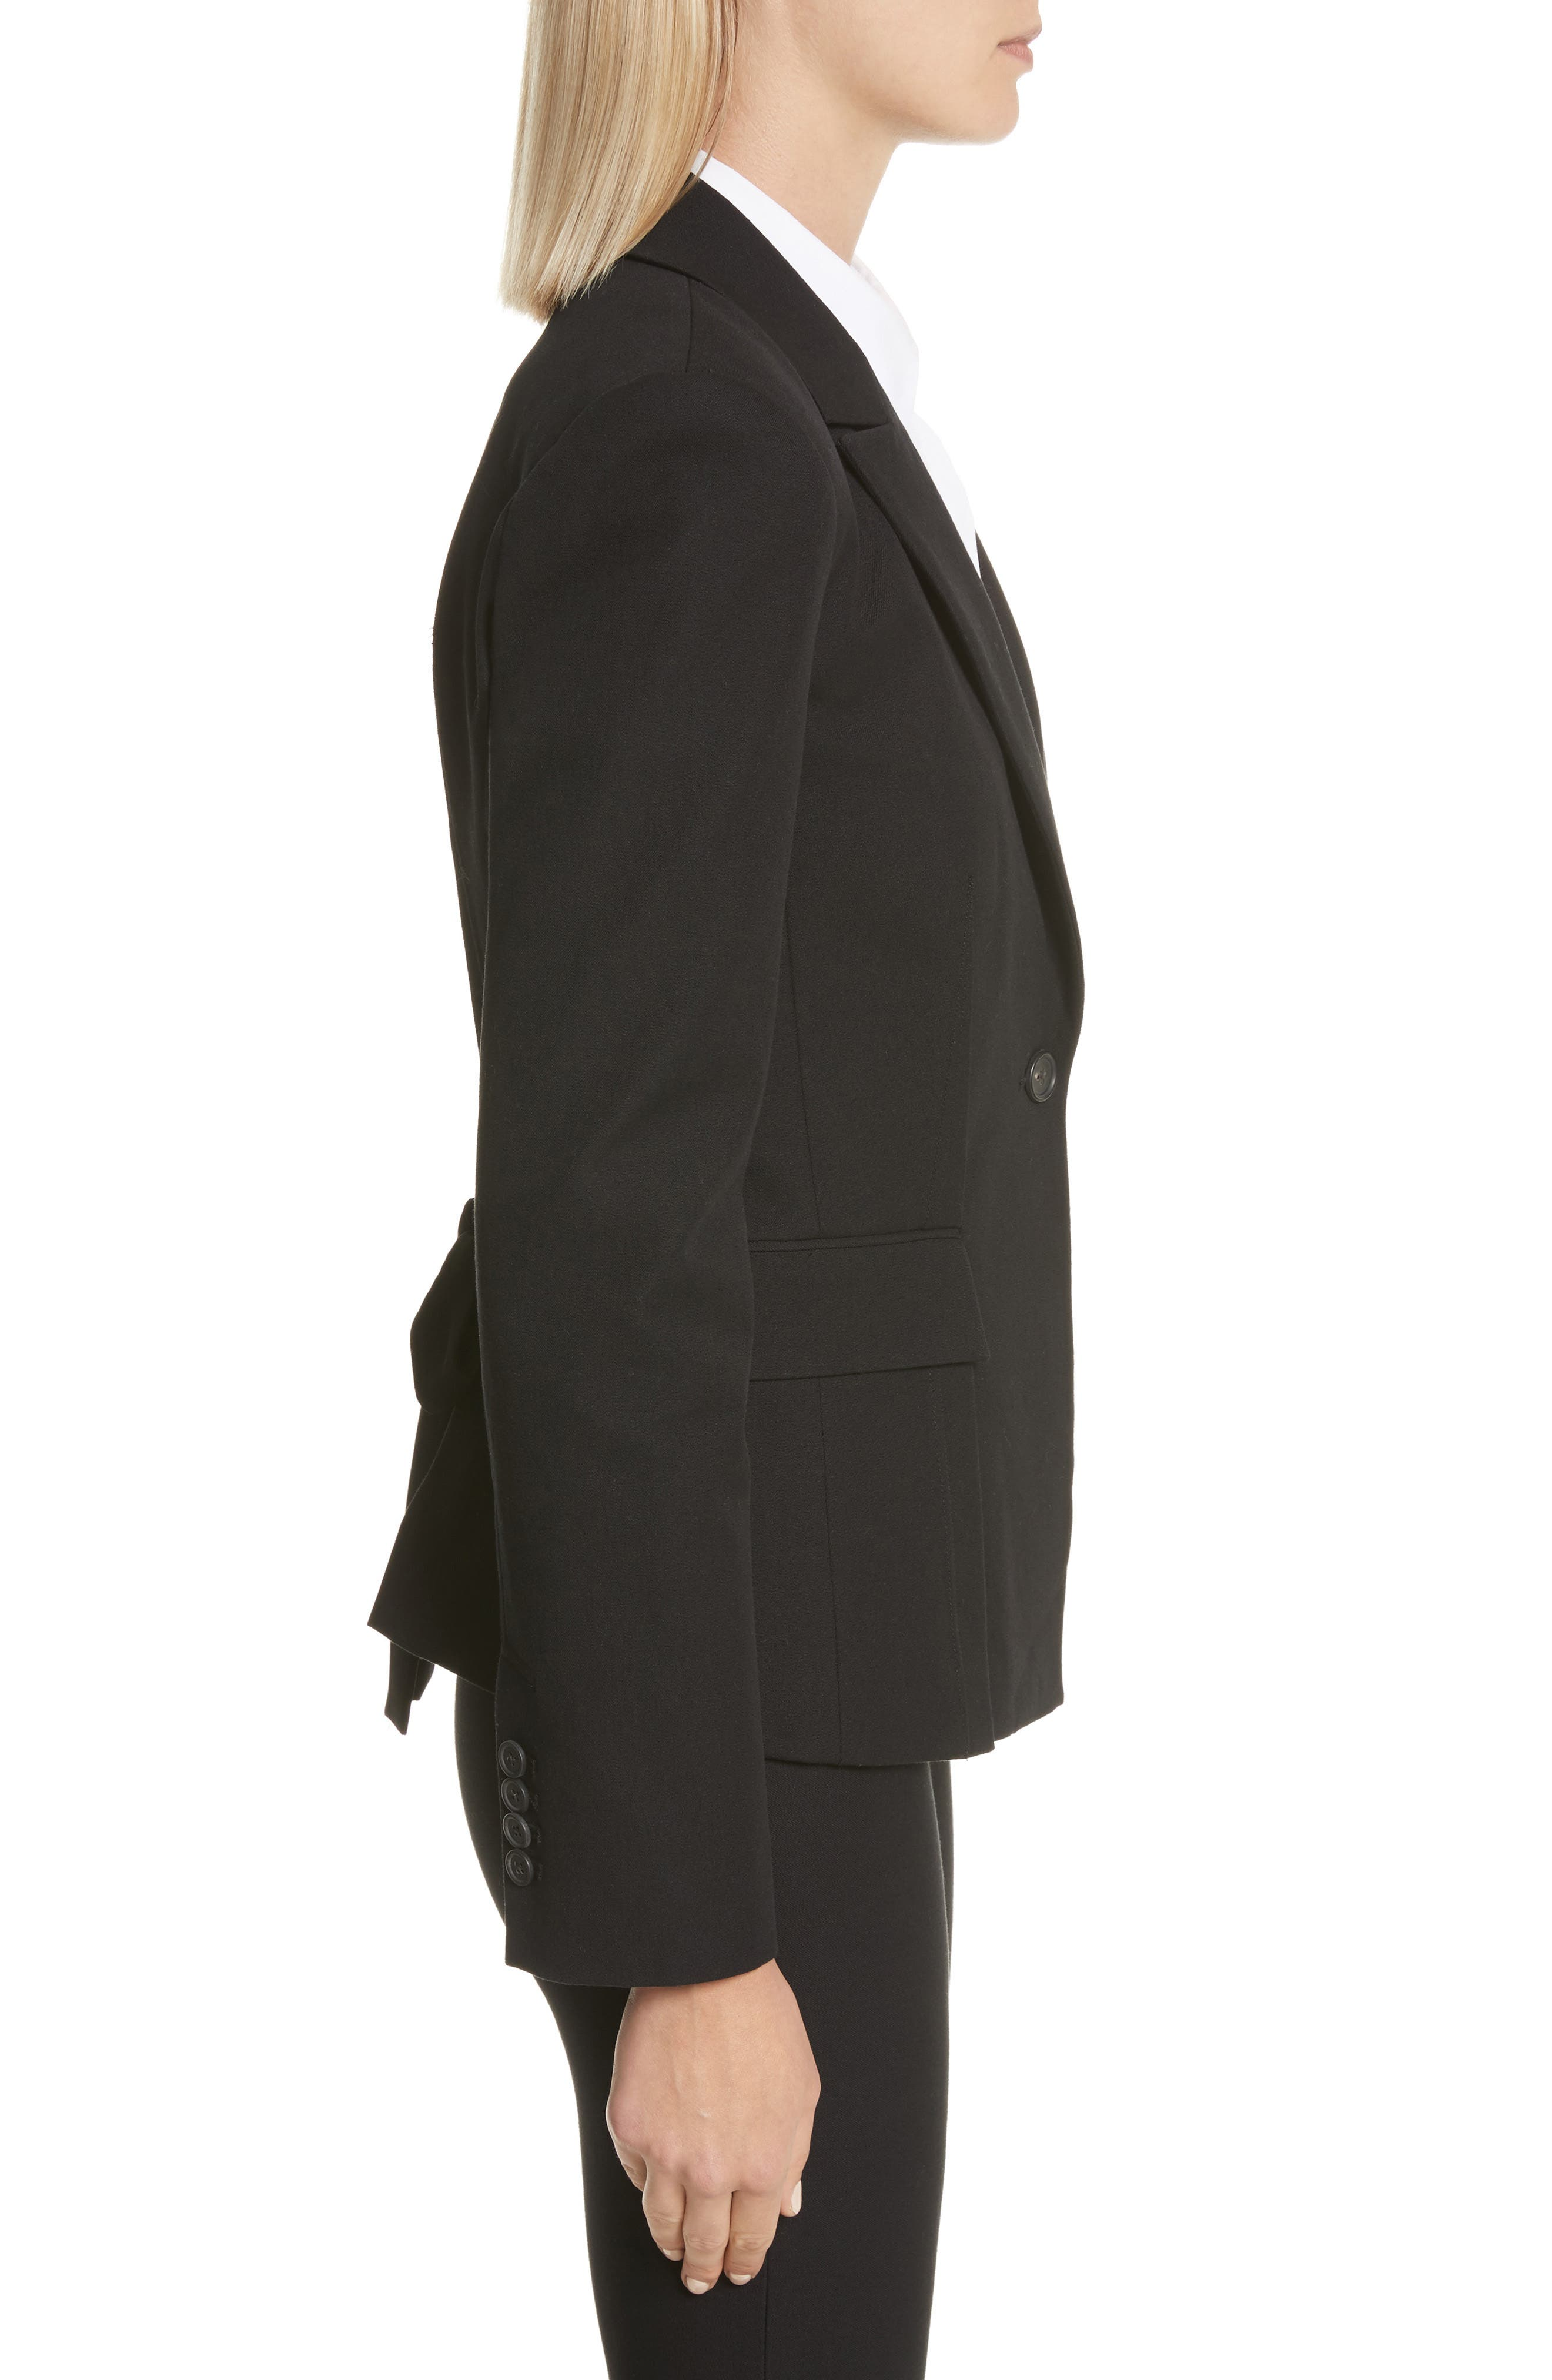 Grommet Tie Back Blazer,                             Alternate thumbnail 3, color,                             Black